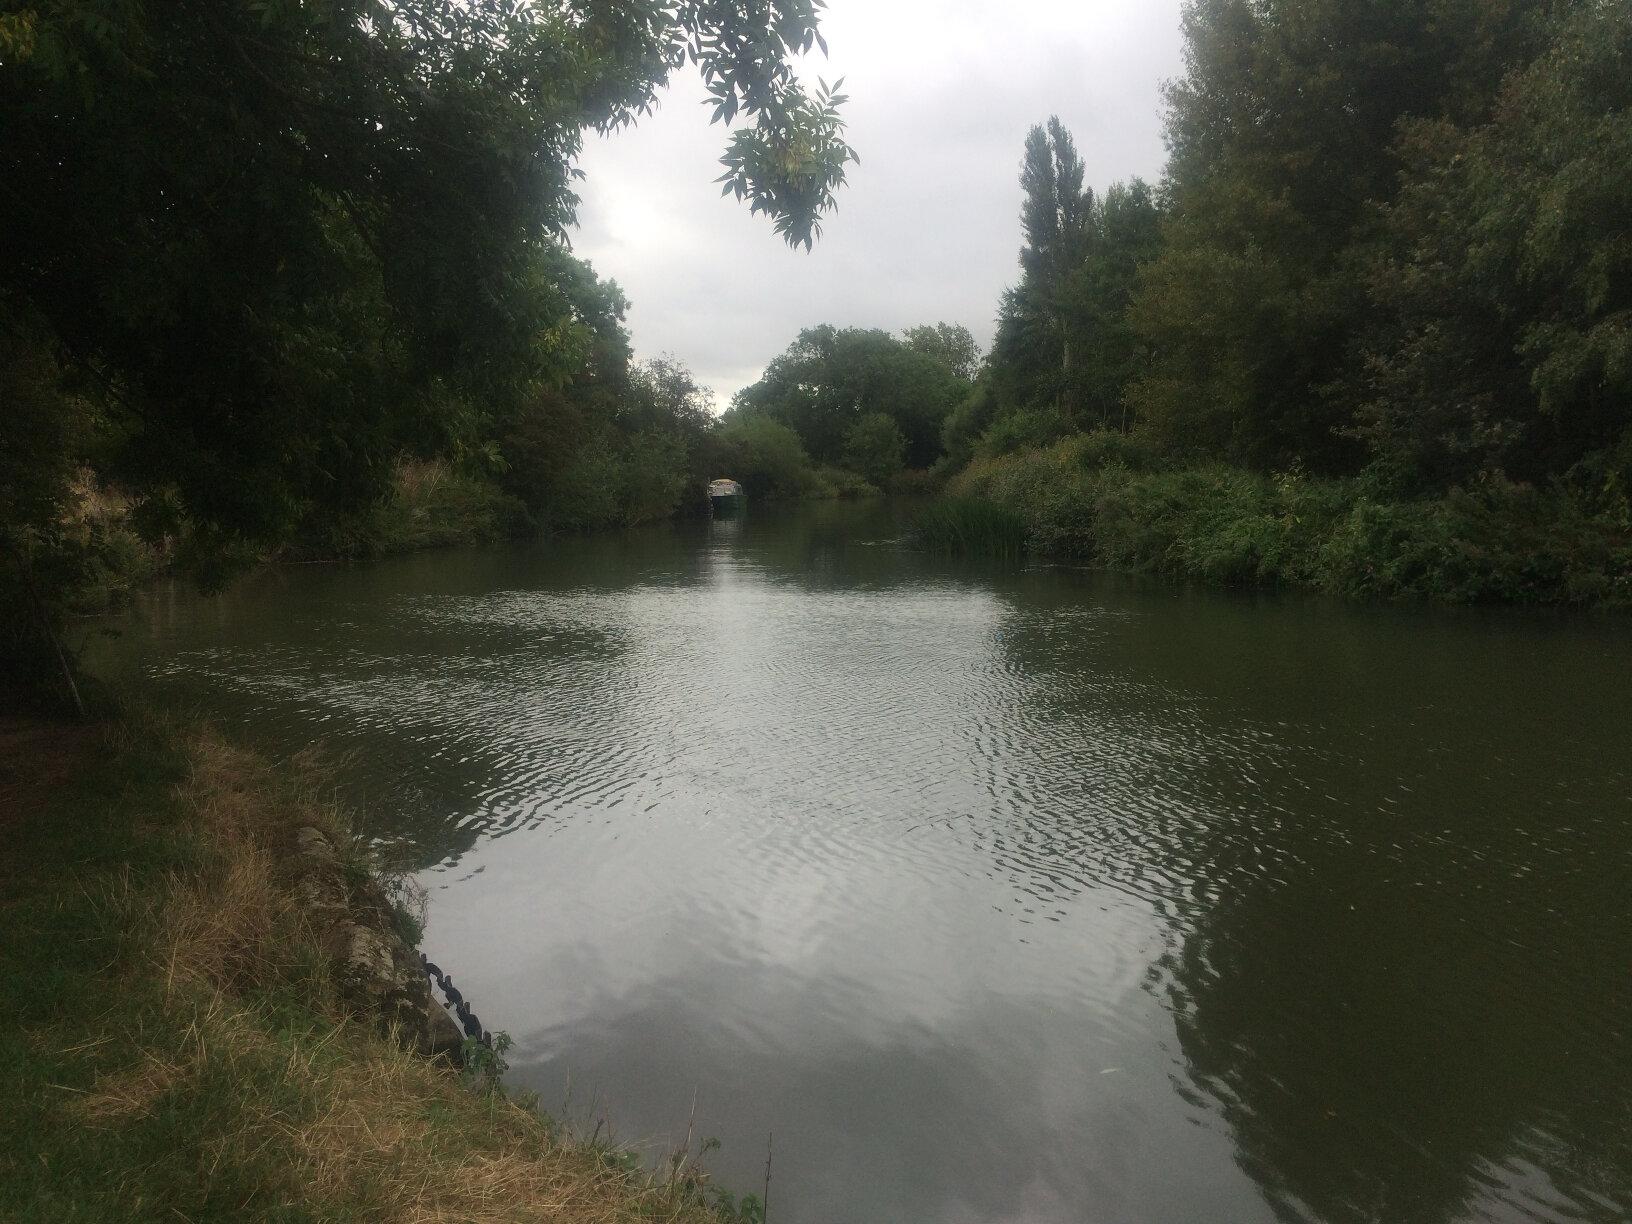 From Lechlade to Newbridge (24)